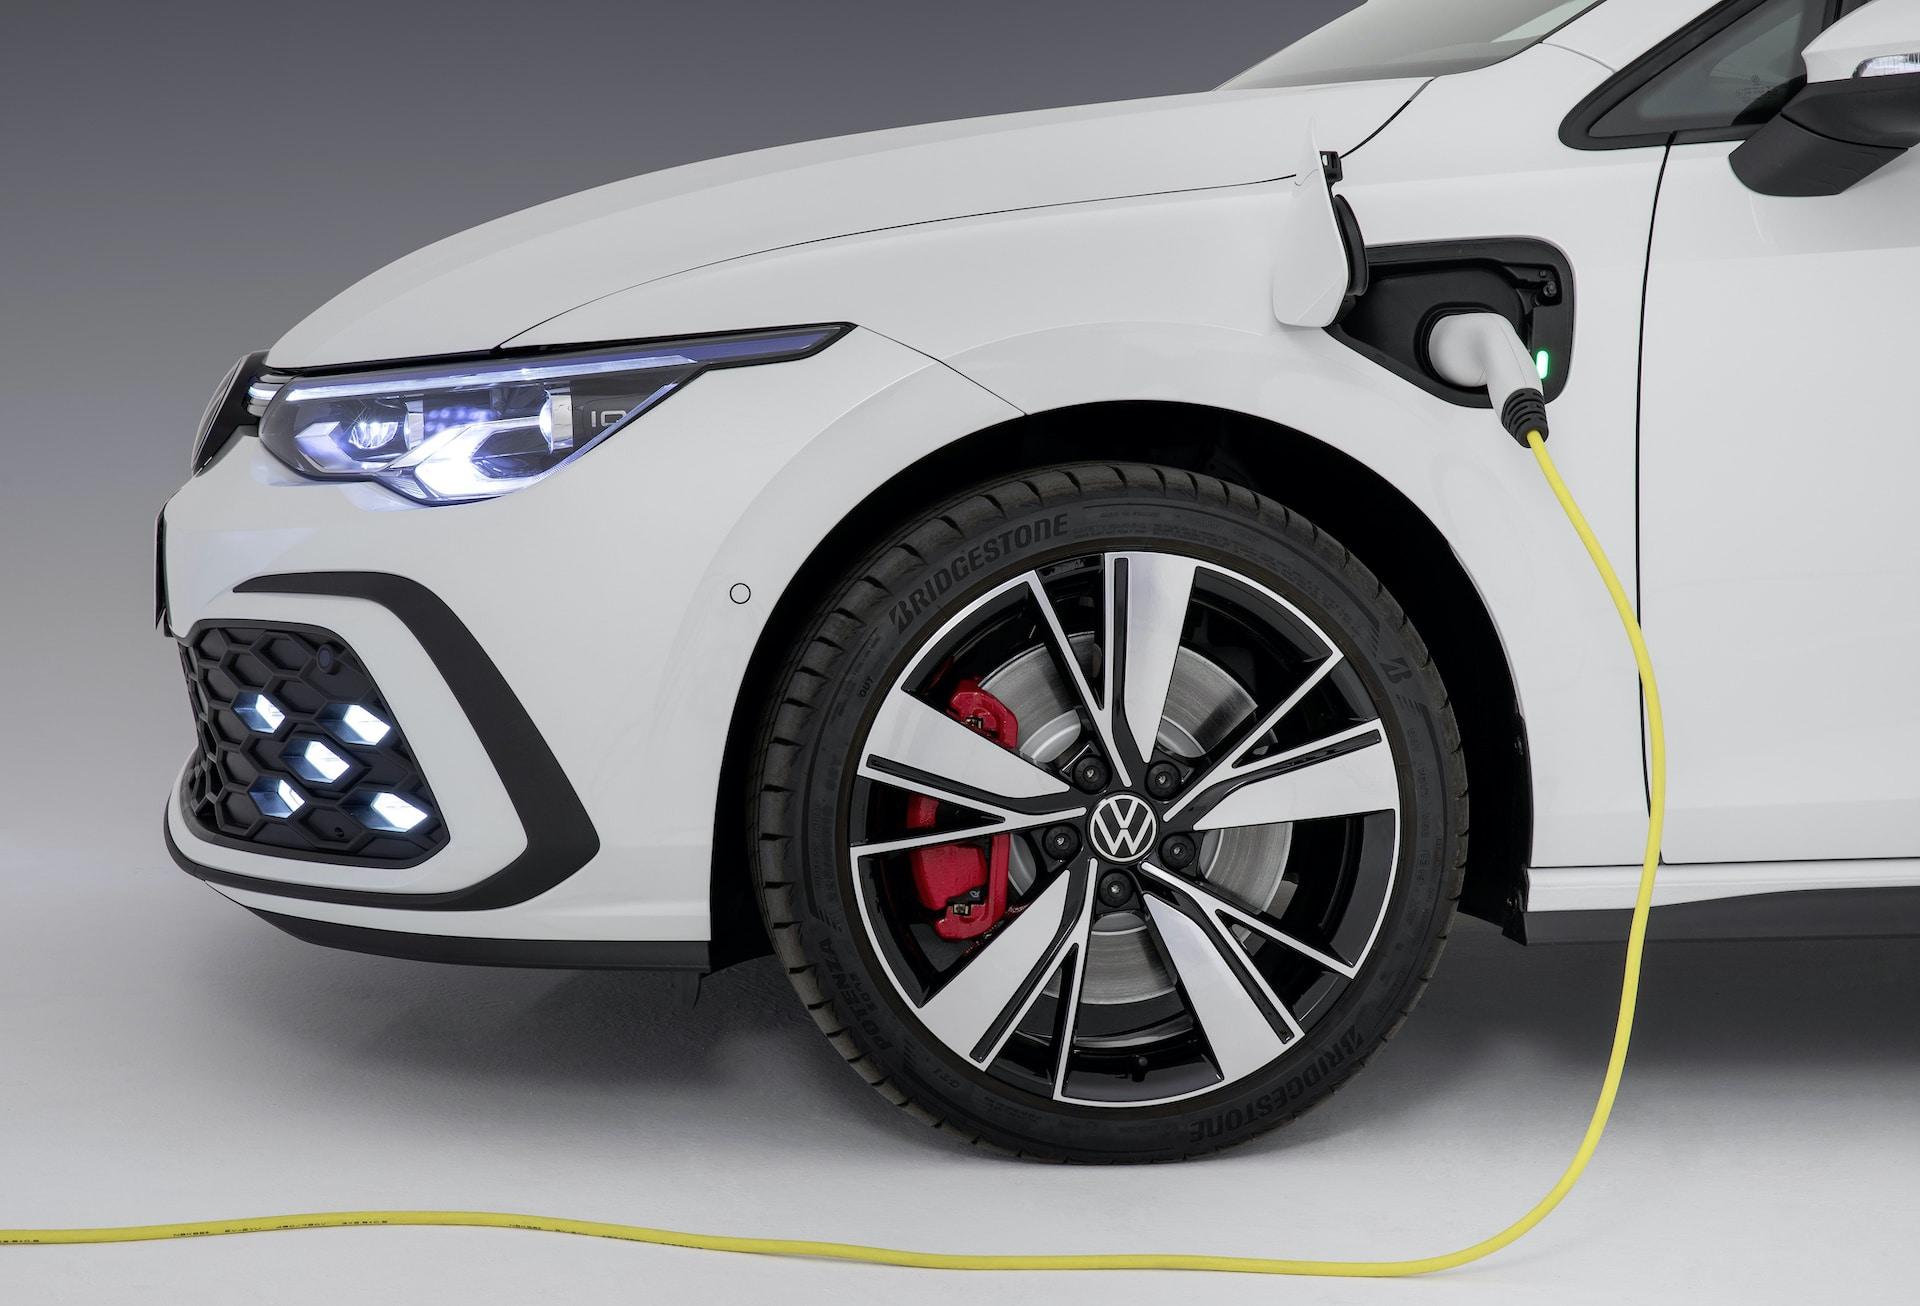 Volkswagen Mildhybrid Plug-in-Hybrid